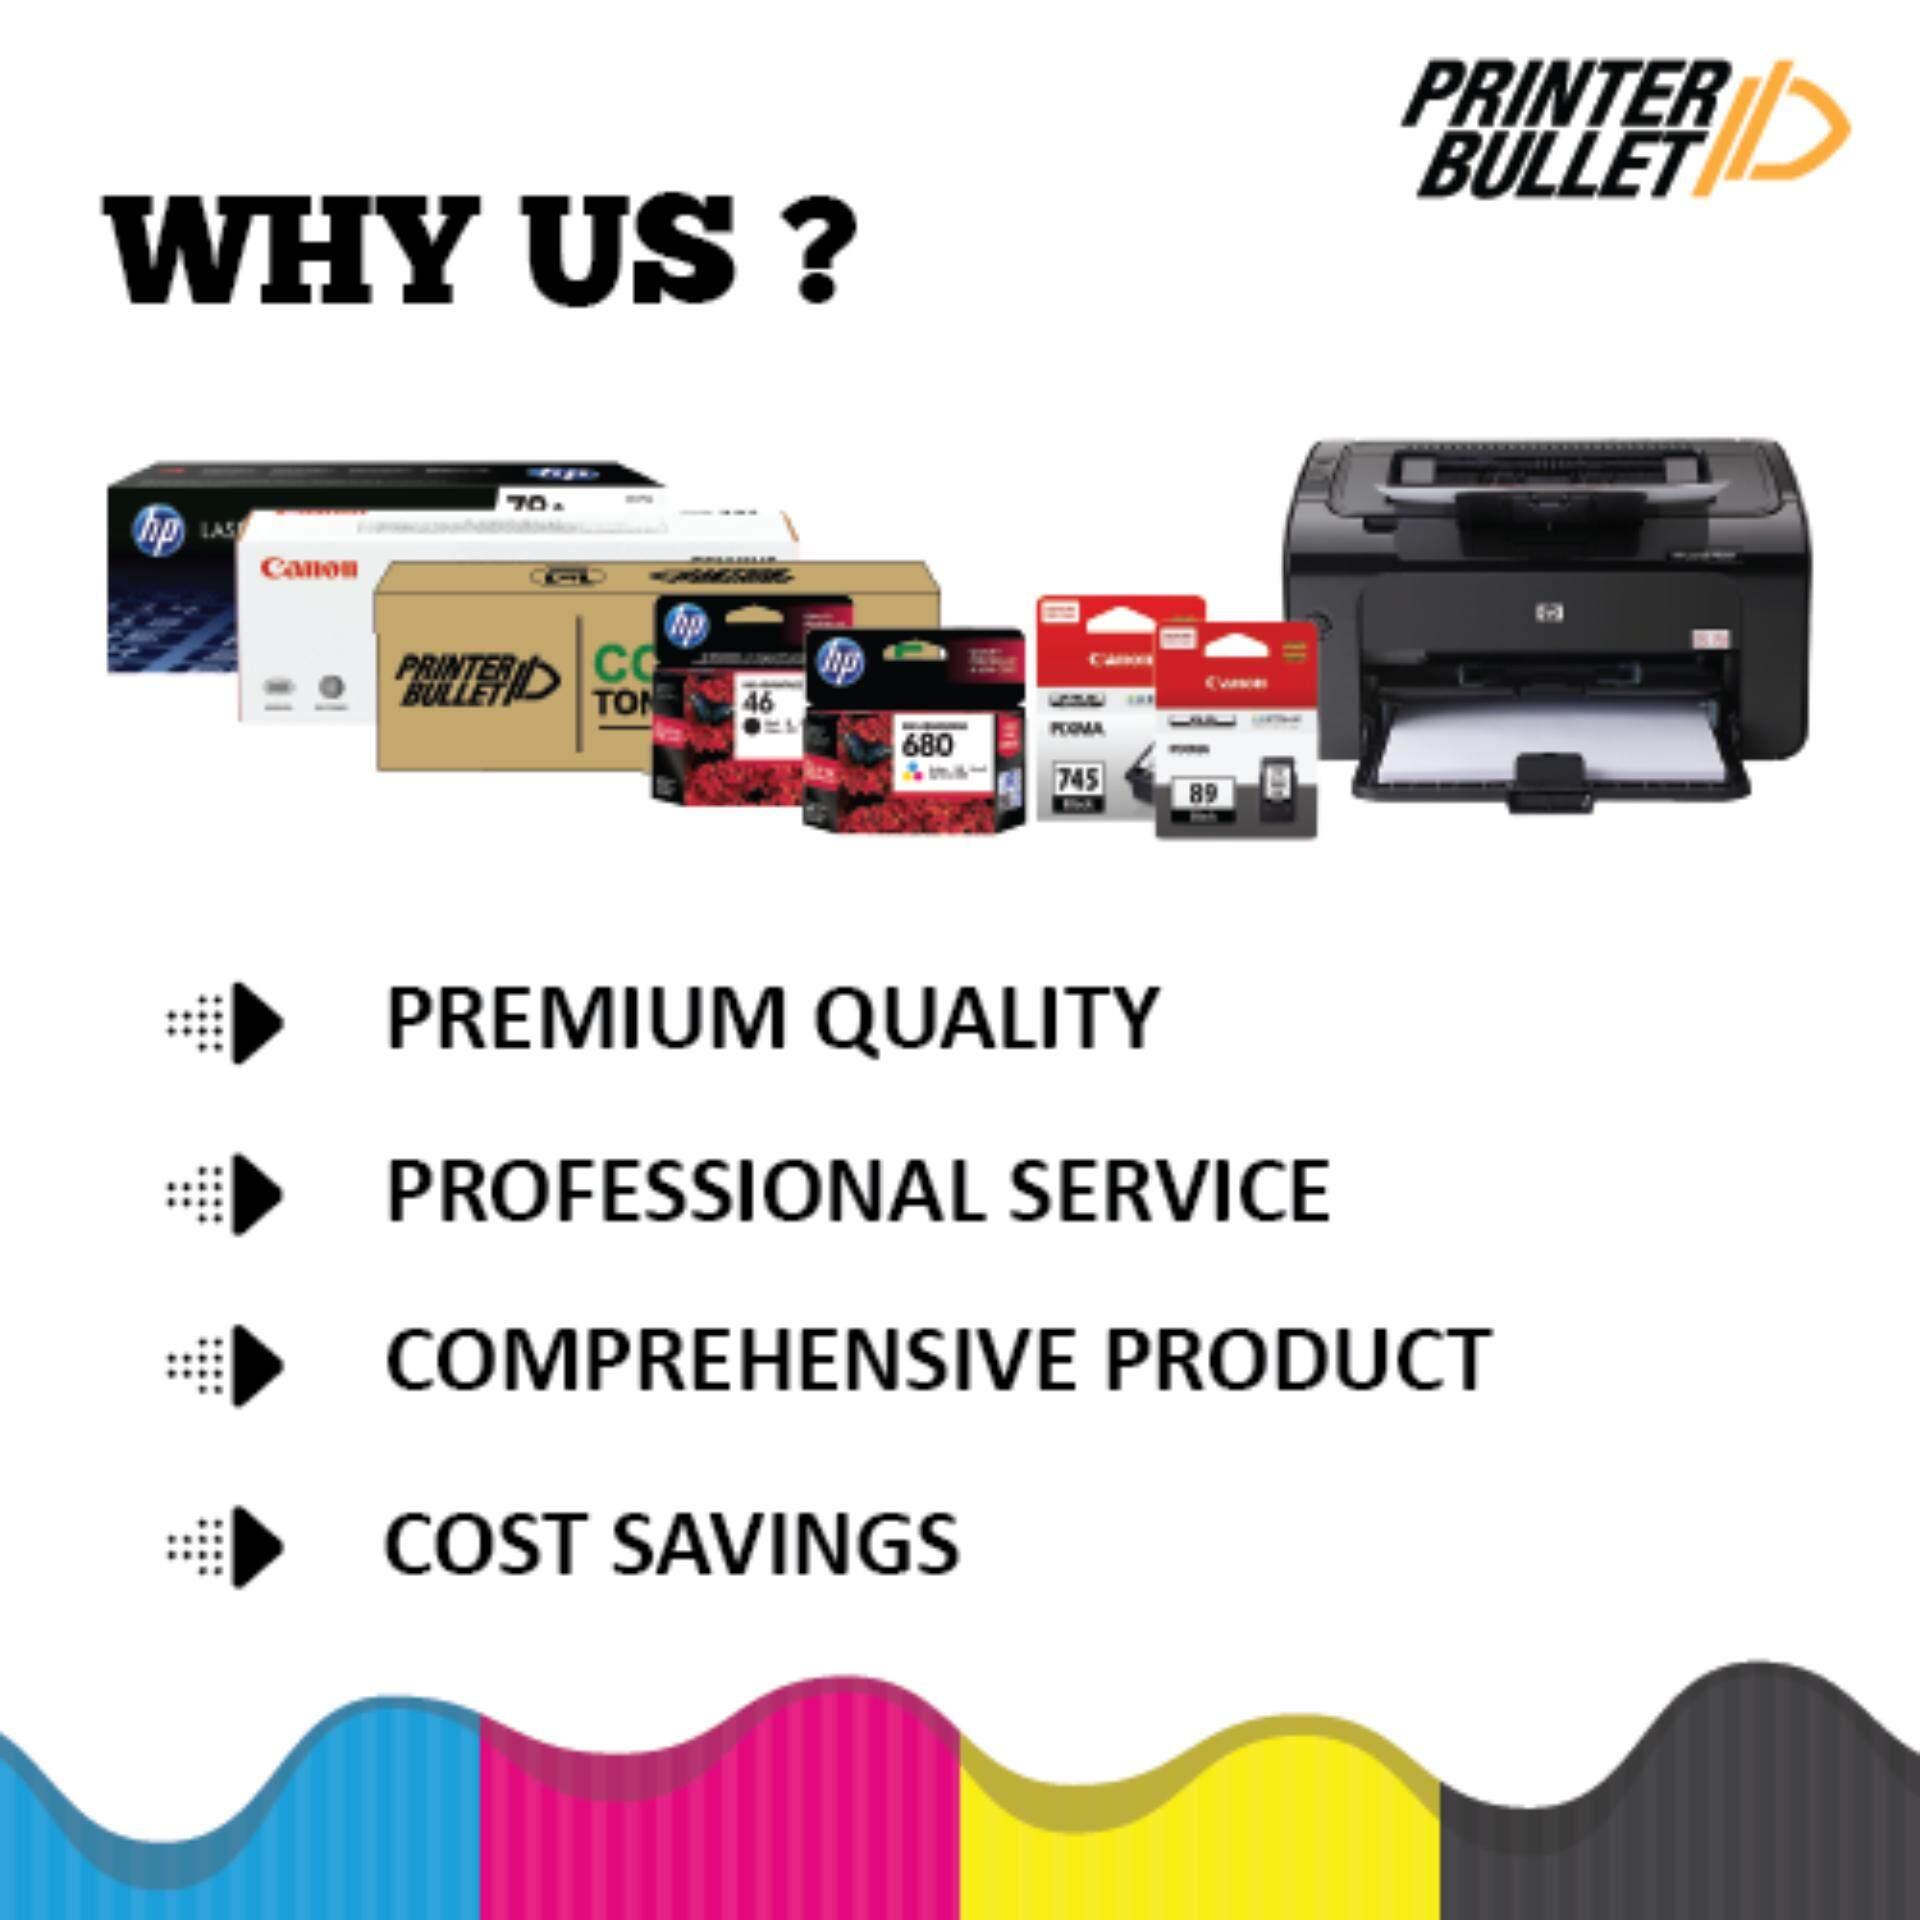 10 unit Ricoh SP200 / SP201 / SP204 / SP201n / SP201nw / SP203s / SP204sn / SP204sf / SP204sfn / SP204Sfnw / SP211 / SP213nw / SP211su / SP213snw / SP211sf / SP213sfnw Ricoh Aficio Compatible Laser Toner Cartridge